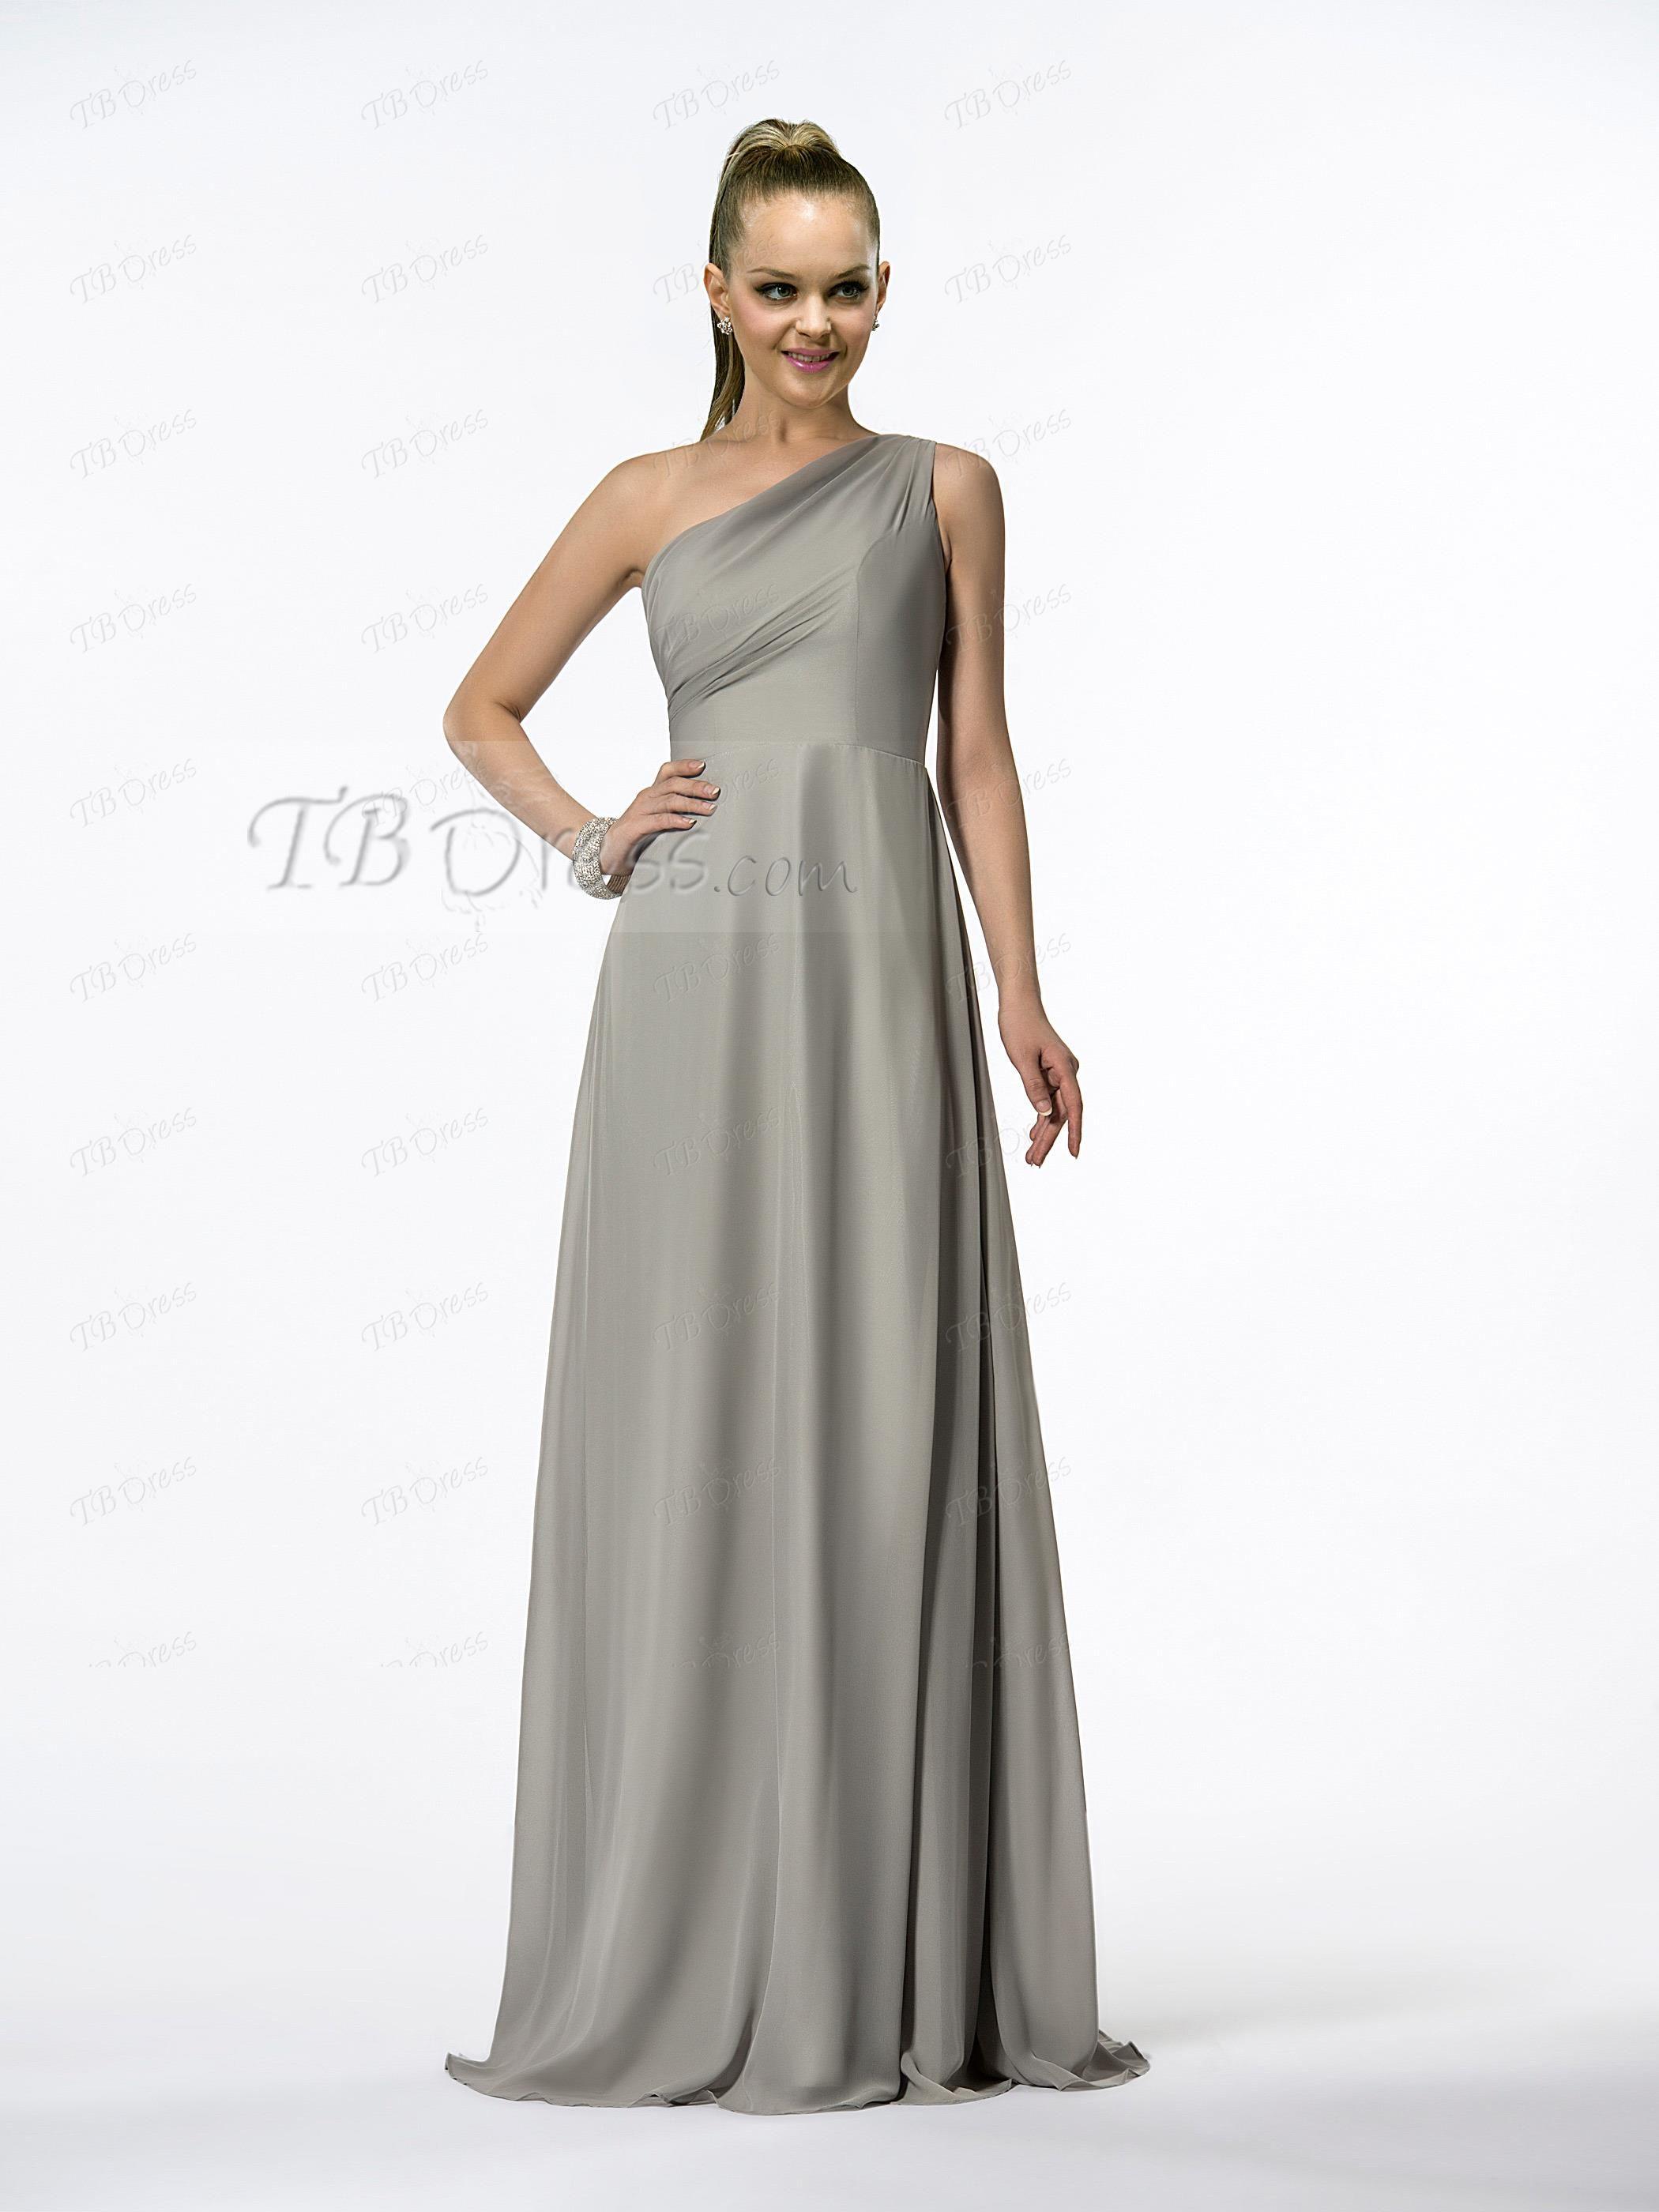 Elegant ALine OneShoulder FloorLength Evening Dress